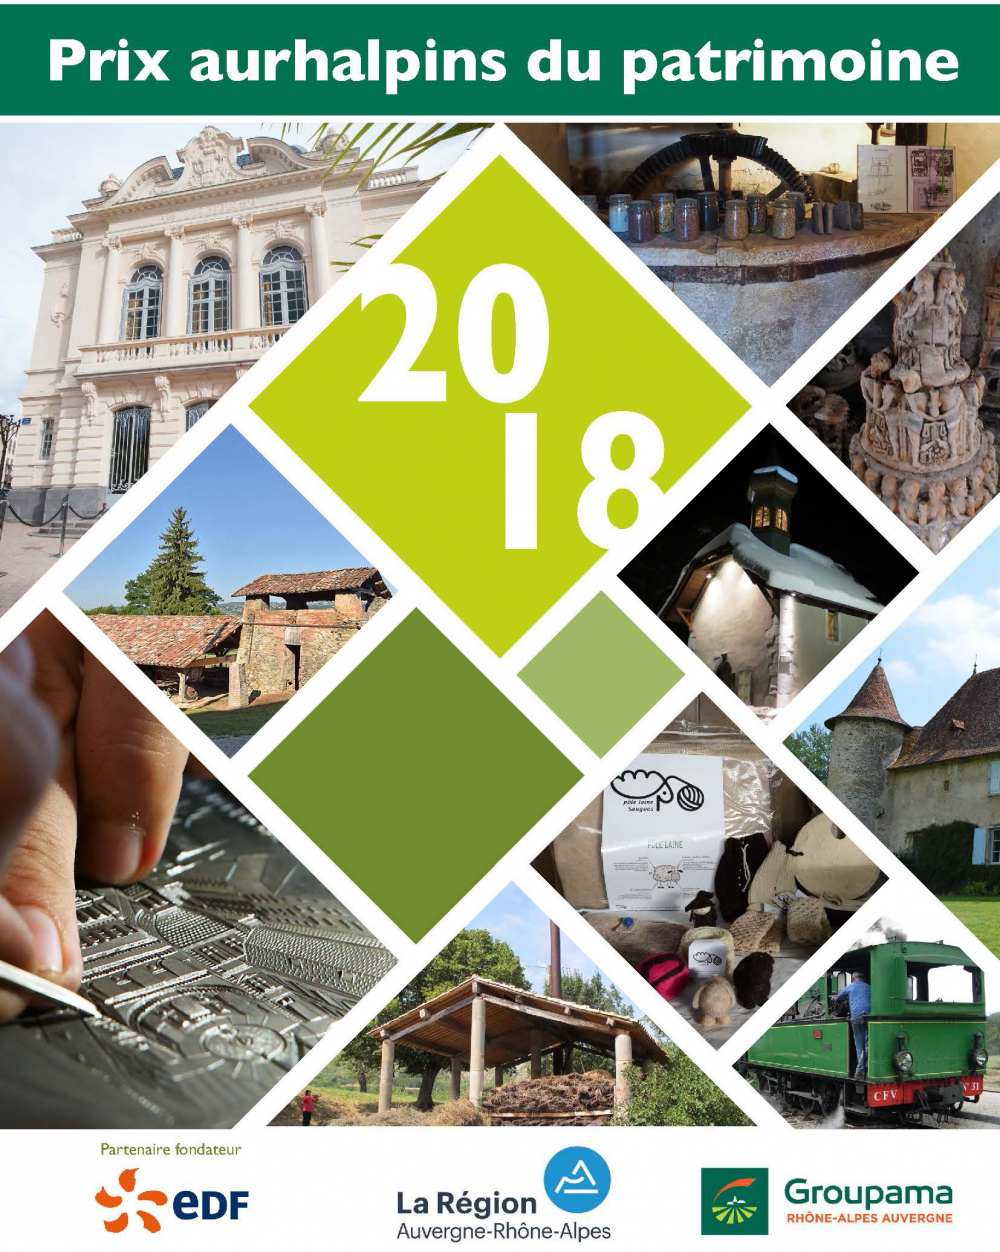 Prix aurhalpins du patrimoine 2018